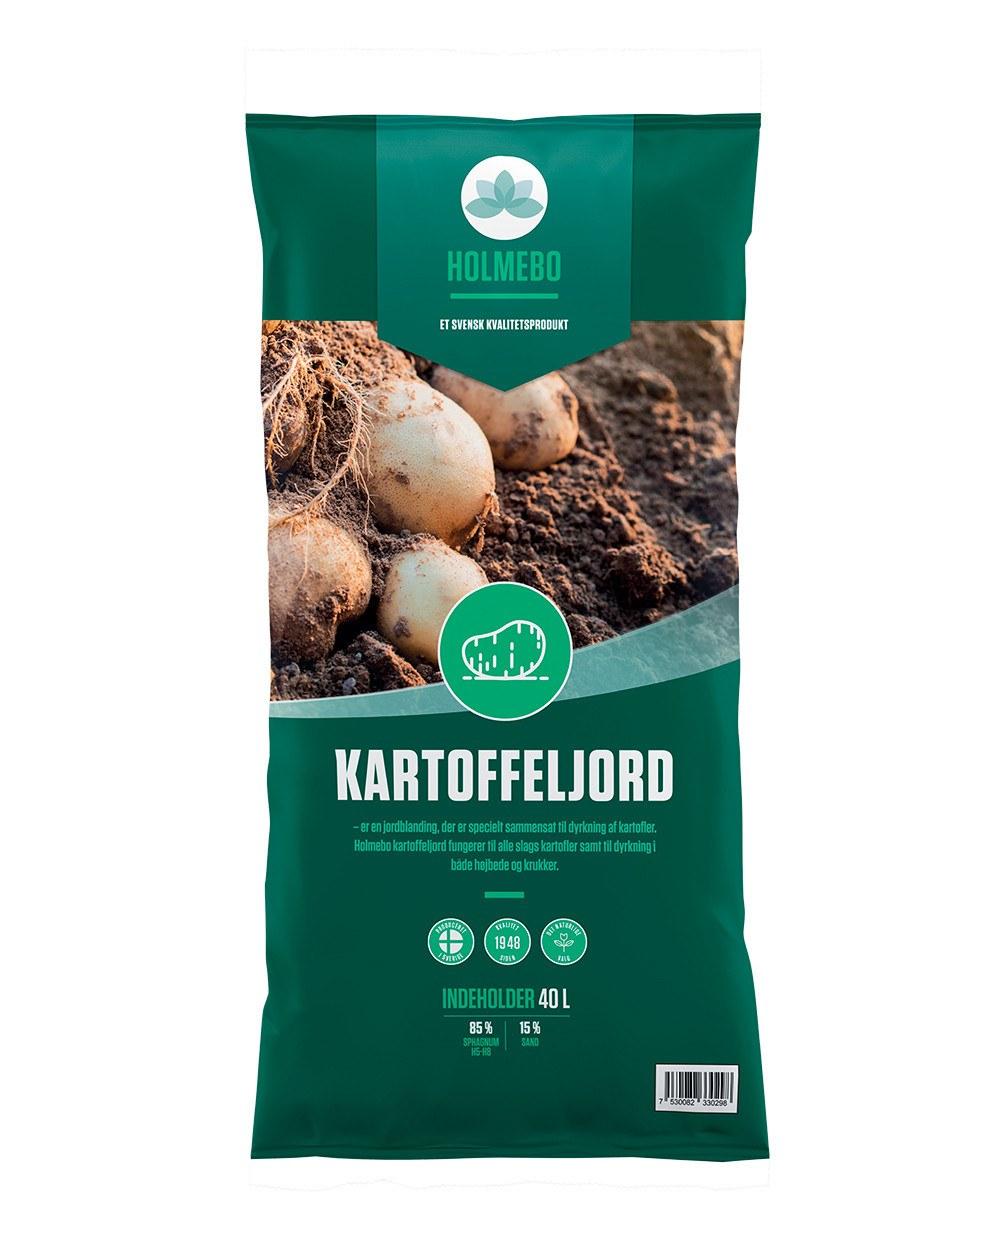 Holmebo Kartoffeljord - 40 liters poser